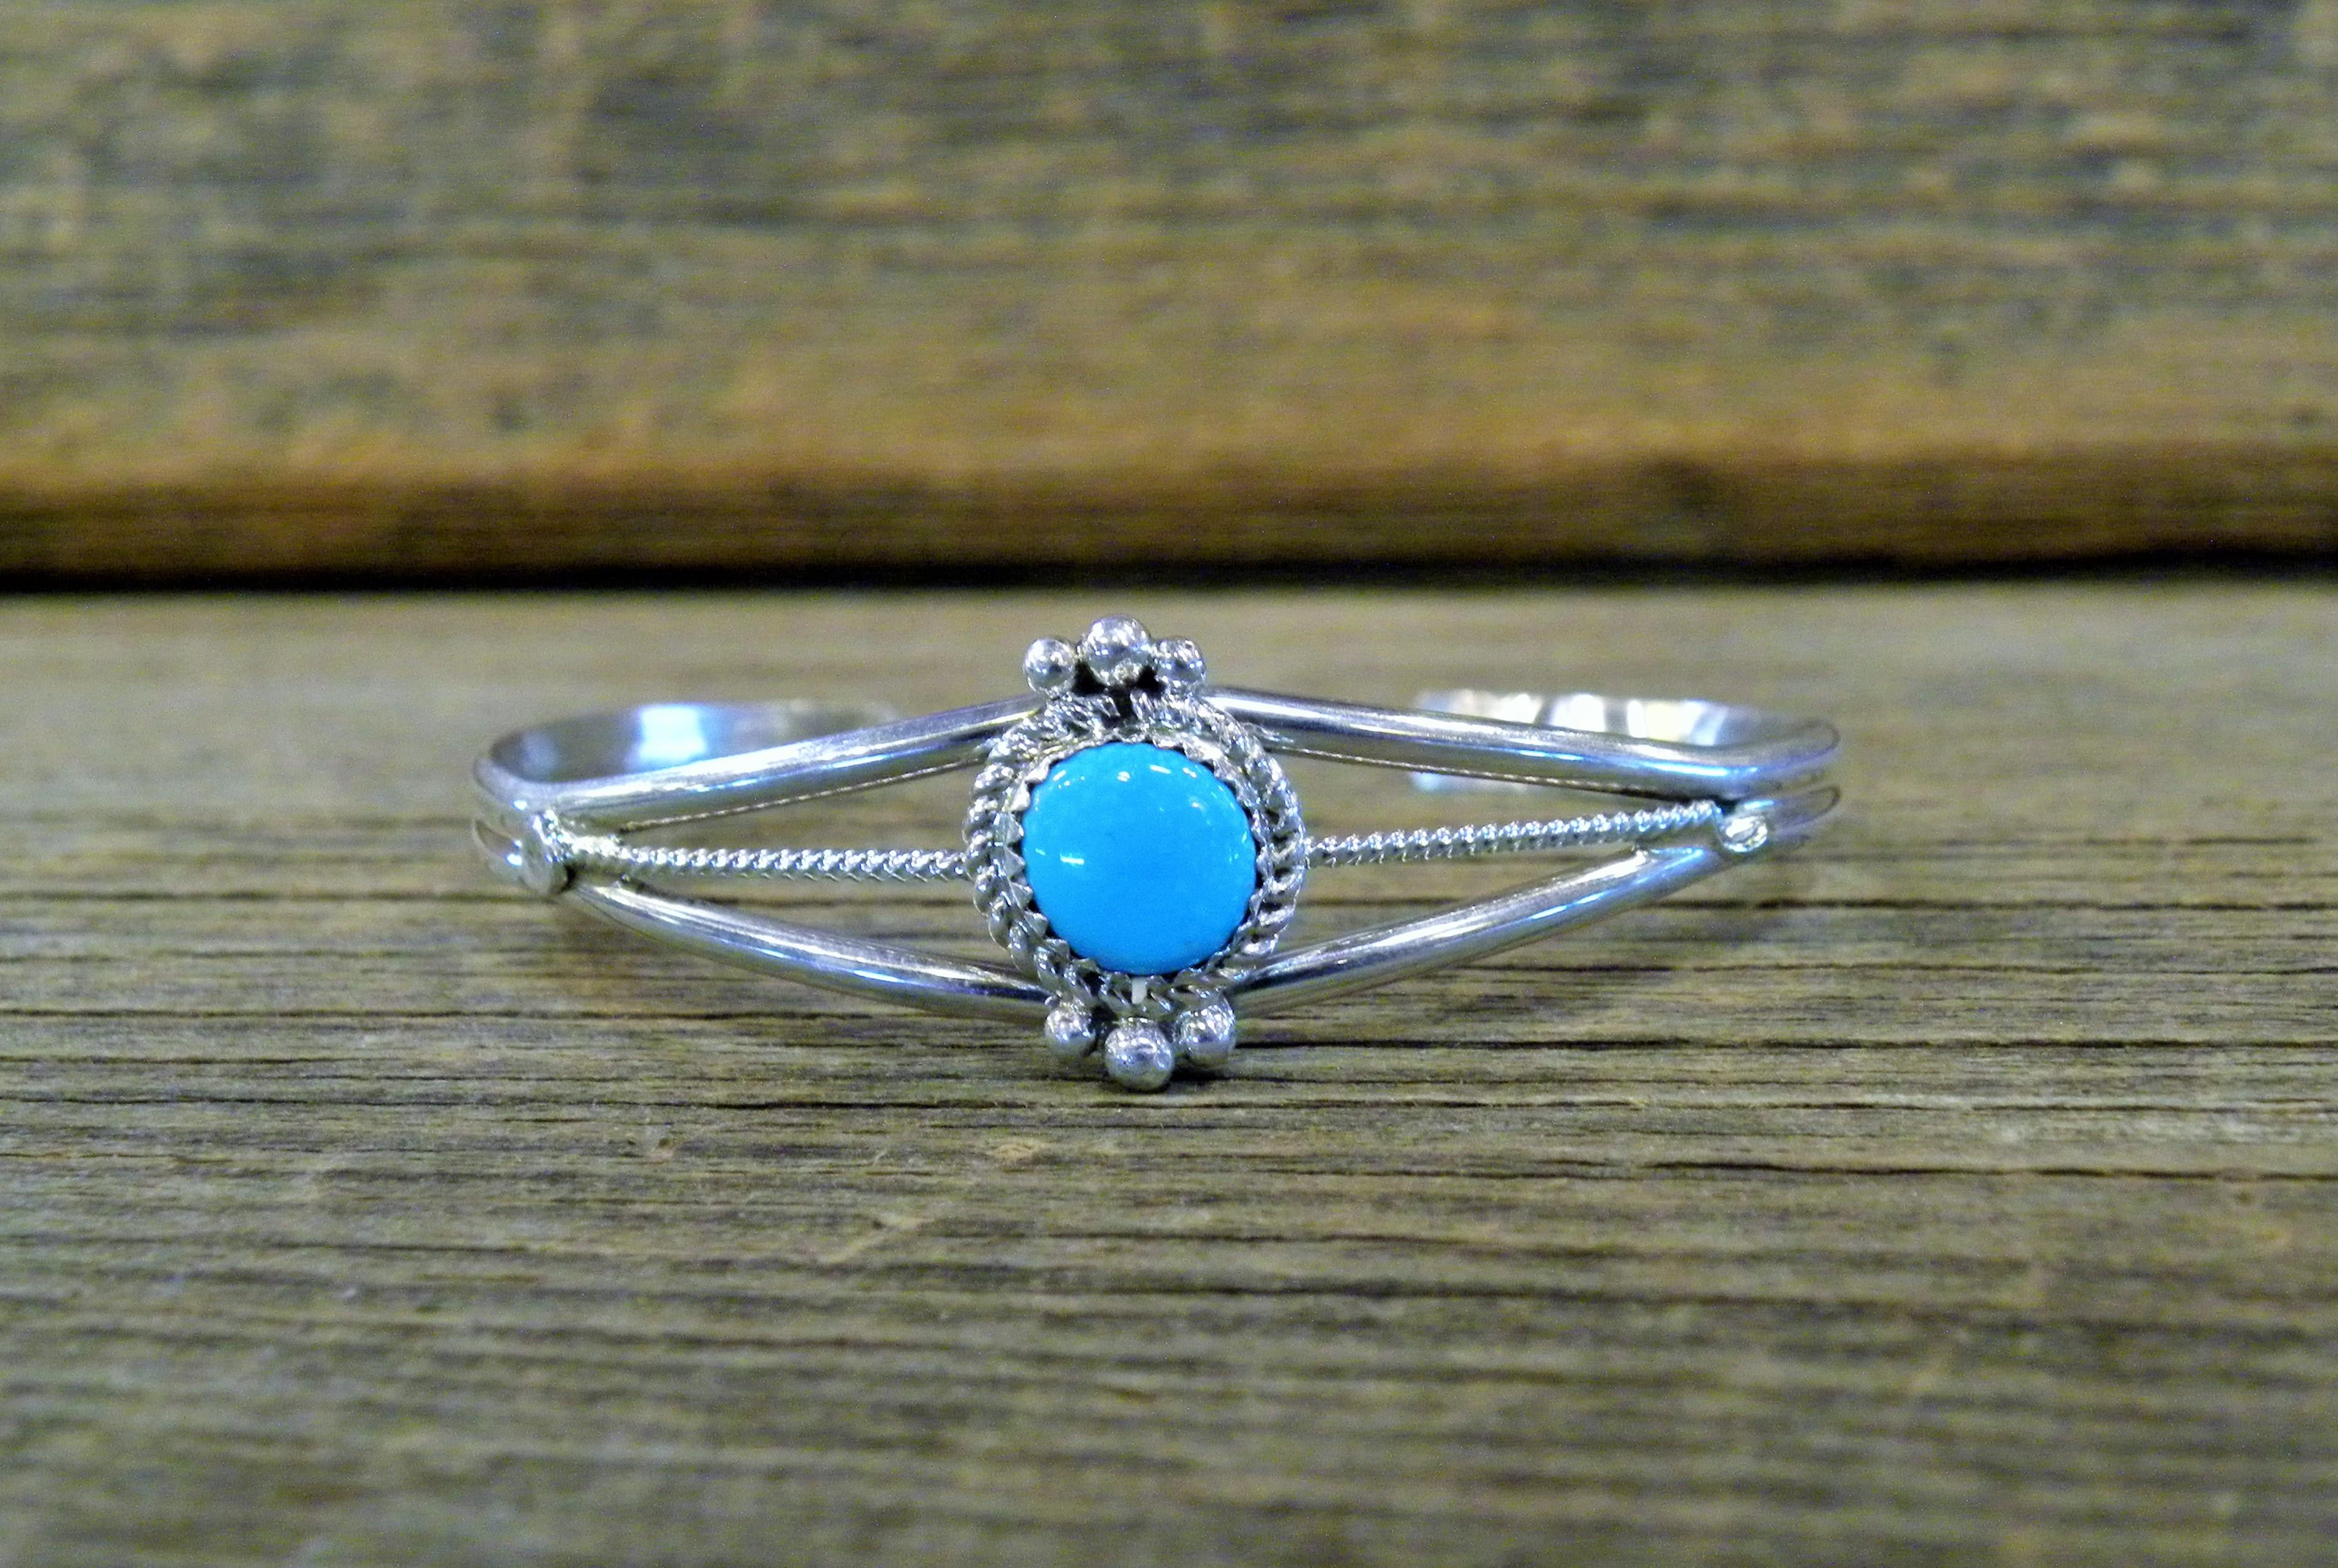 B16- Sleeping Beauty Turquoise Bracelet